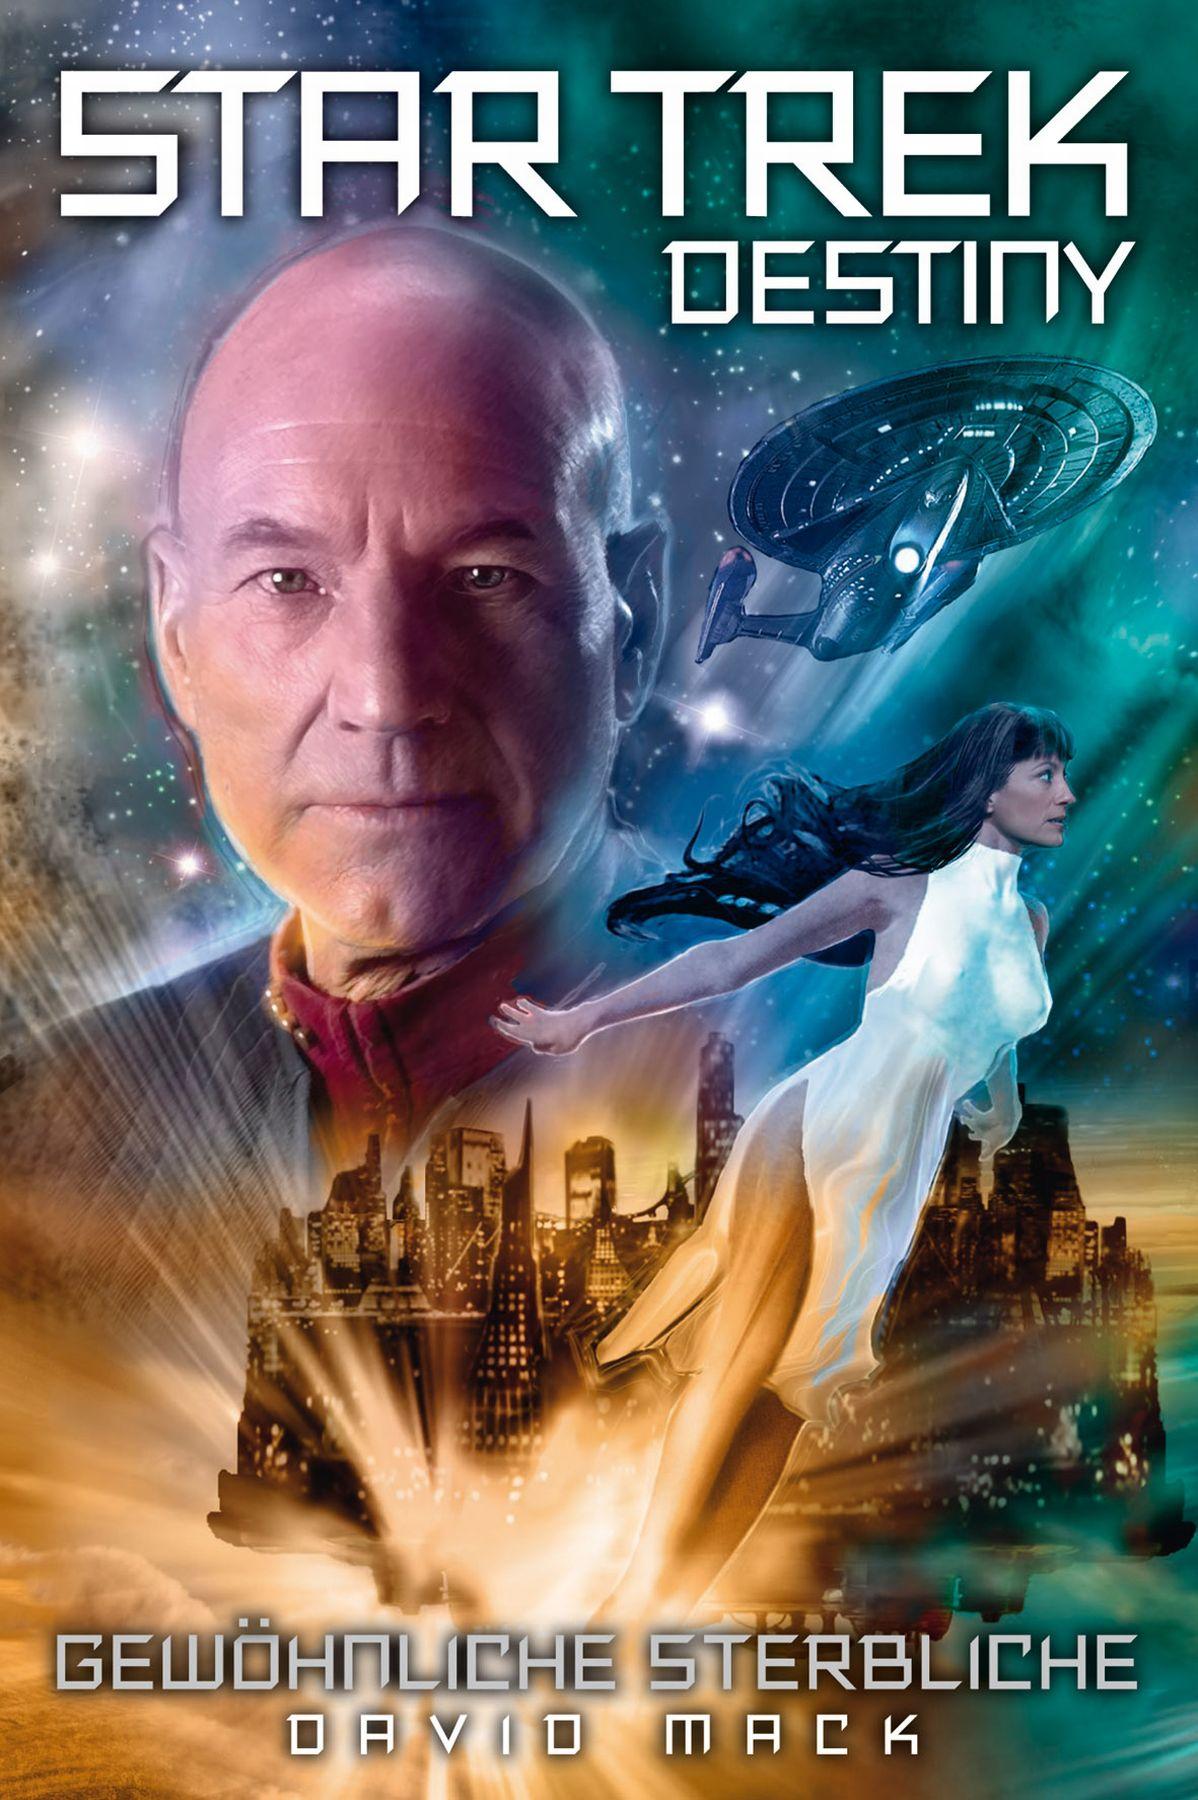 Star Trek Destiny